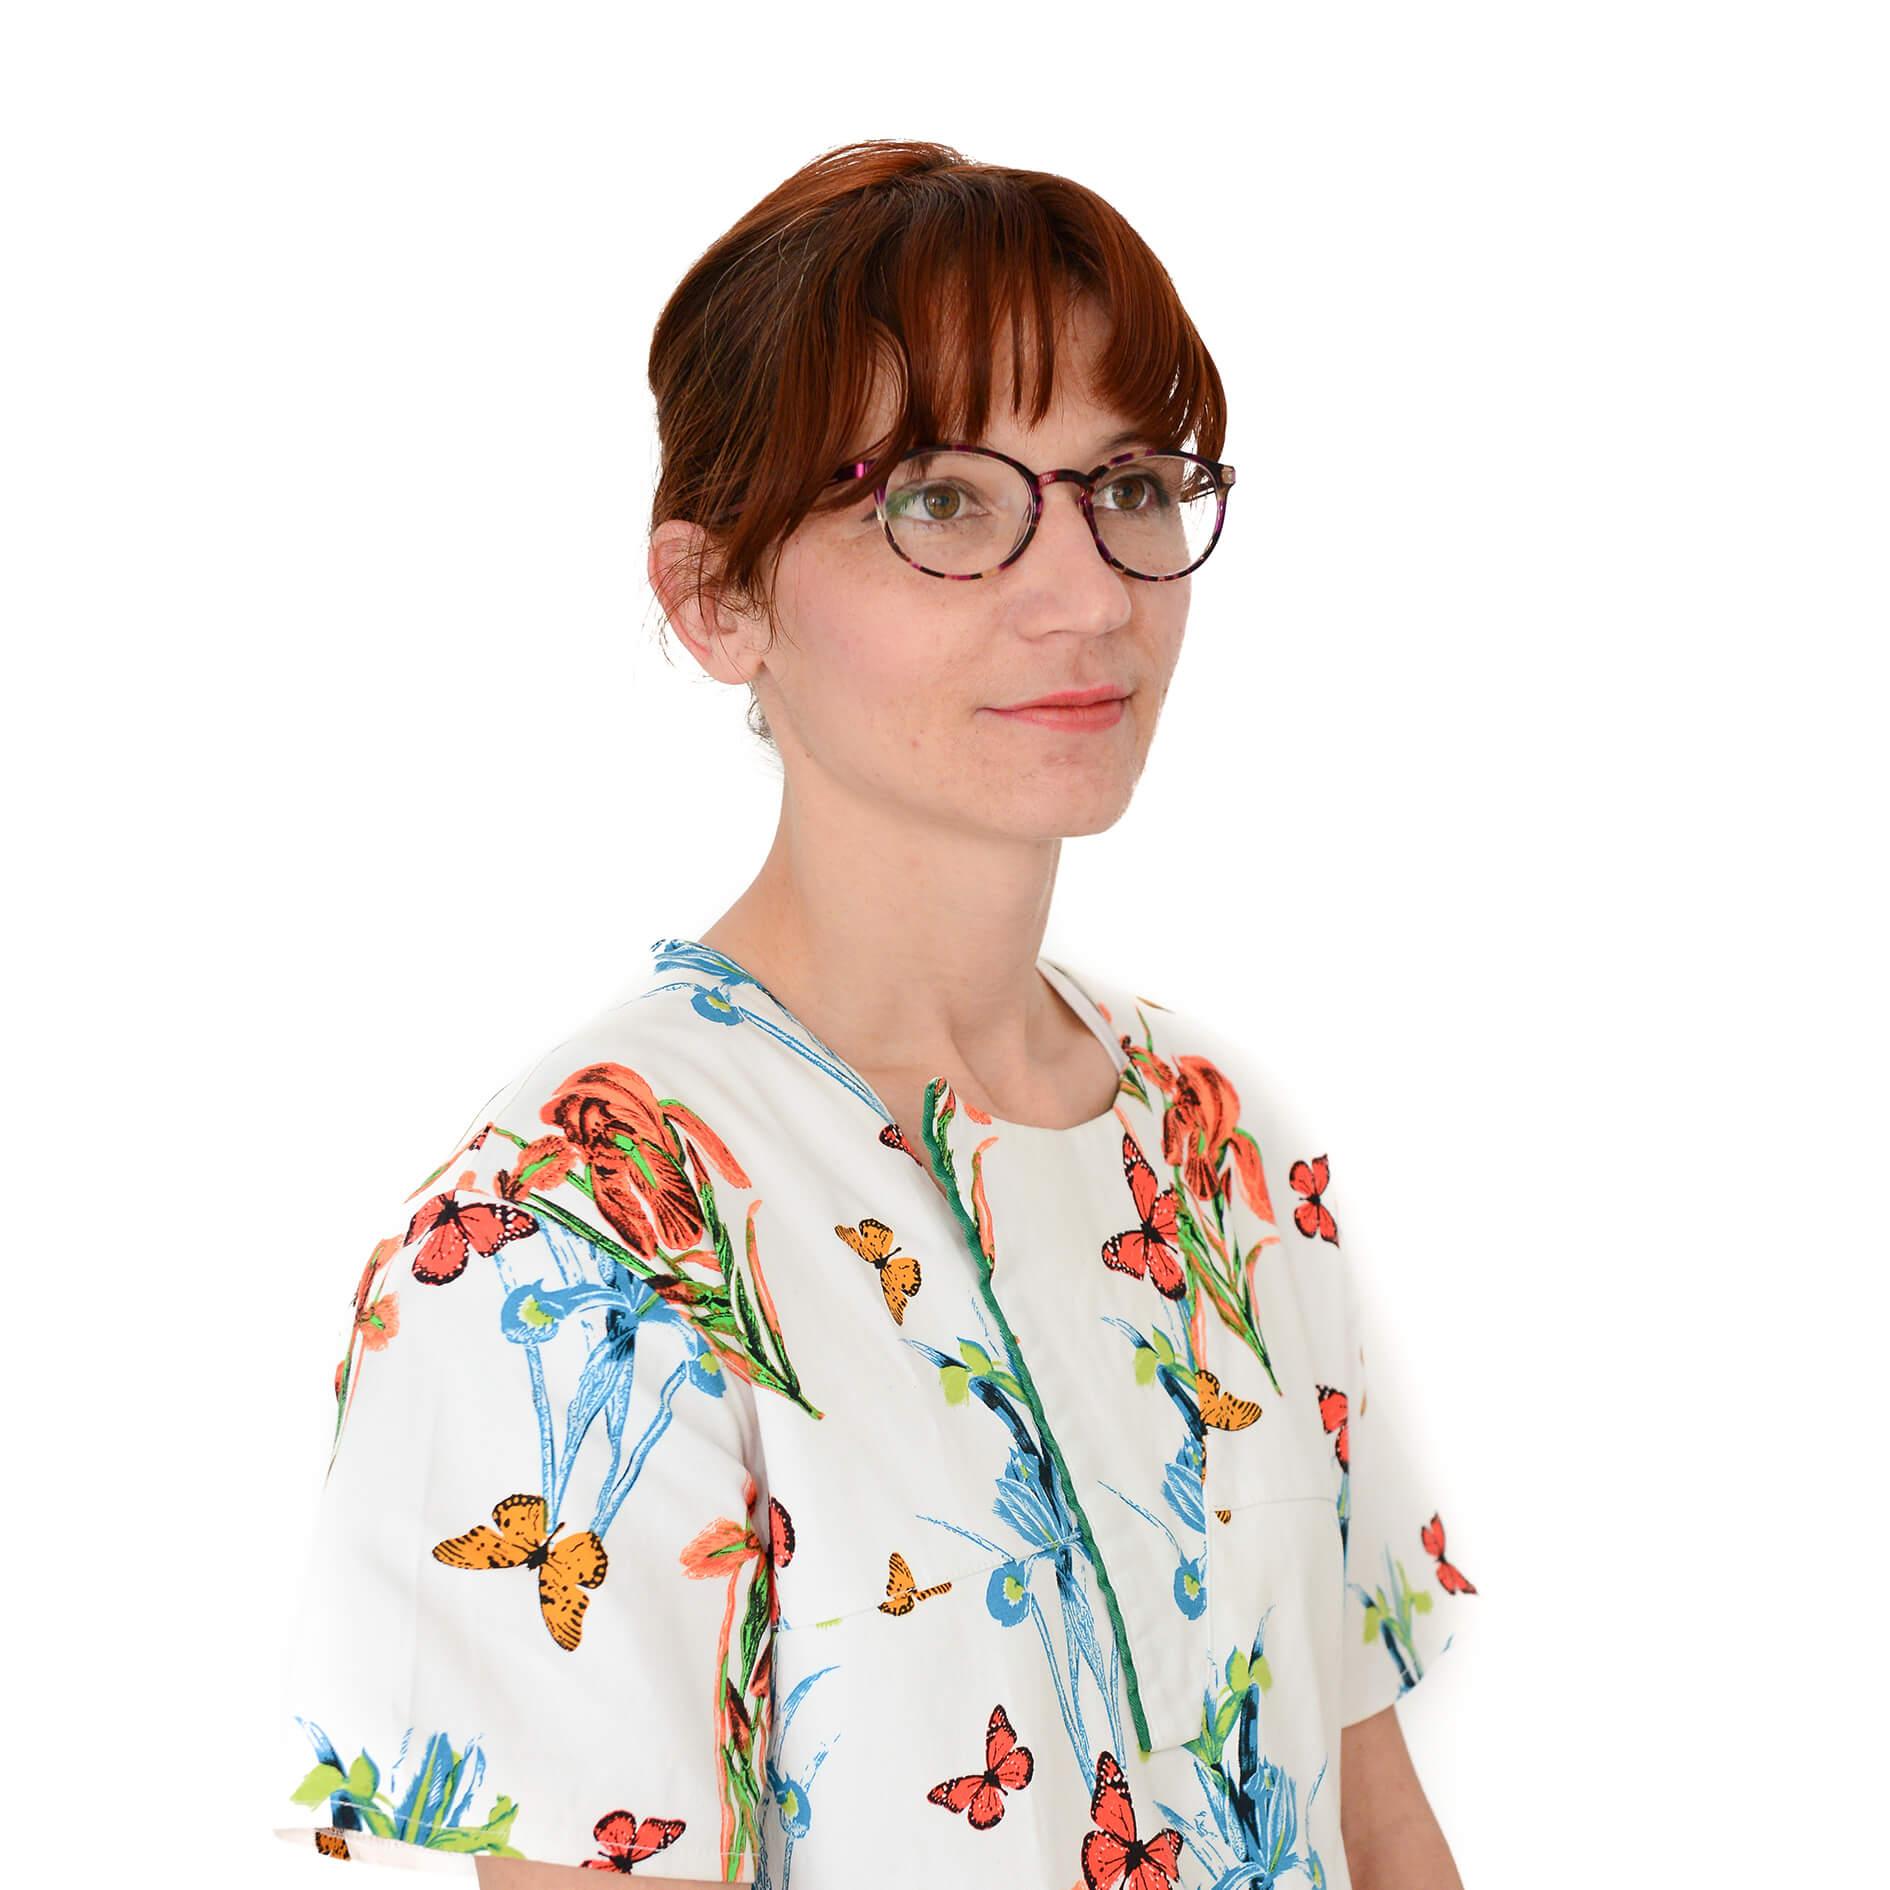 Marilena Vebersohn - asistent medical generalist